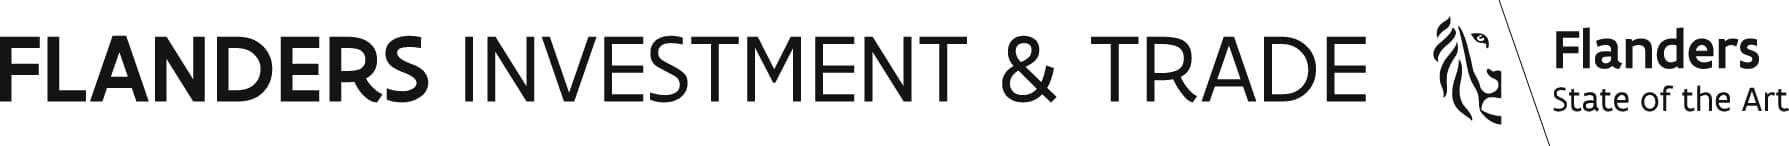 flanders logo